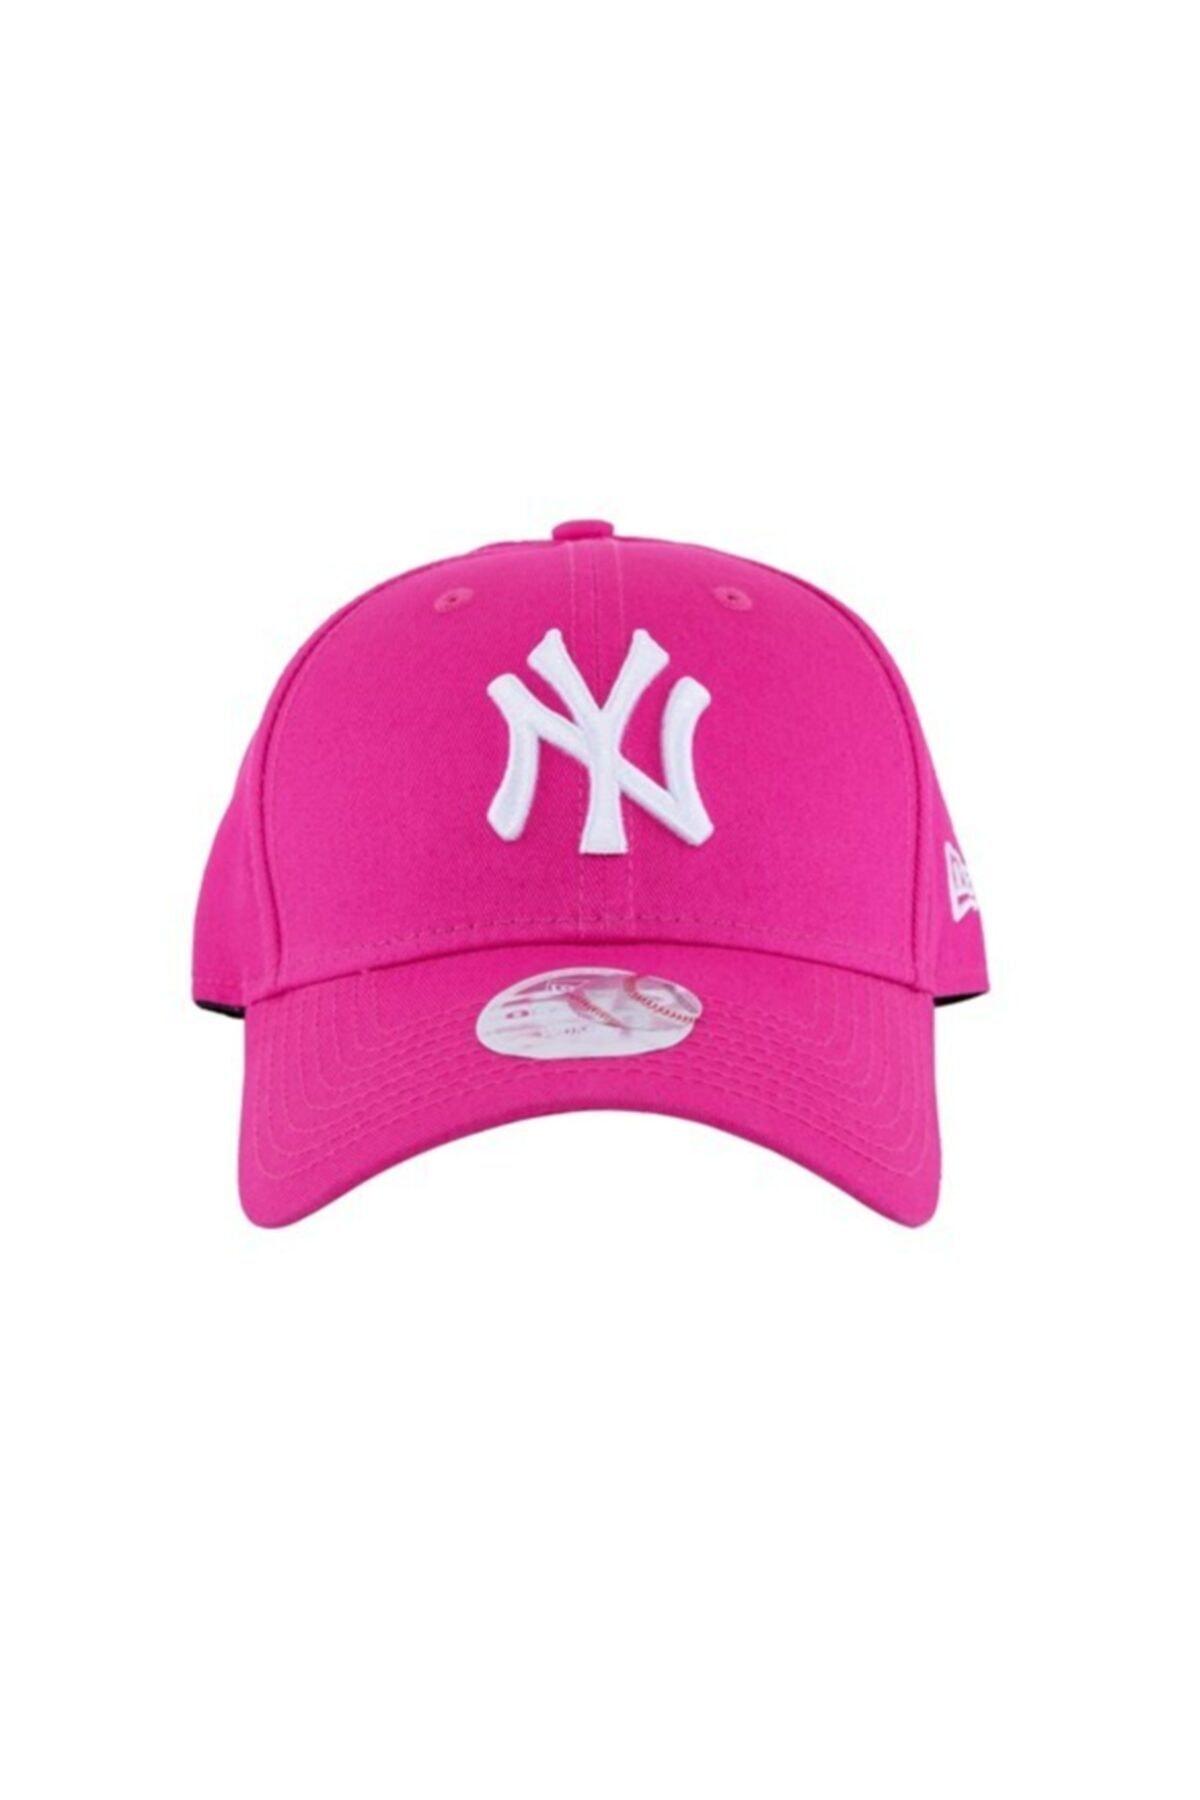 NEW ERA Kadın Şapka - Fashion Essential 9forty New York Yankees Pink/optic White 1